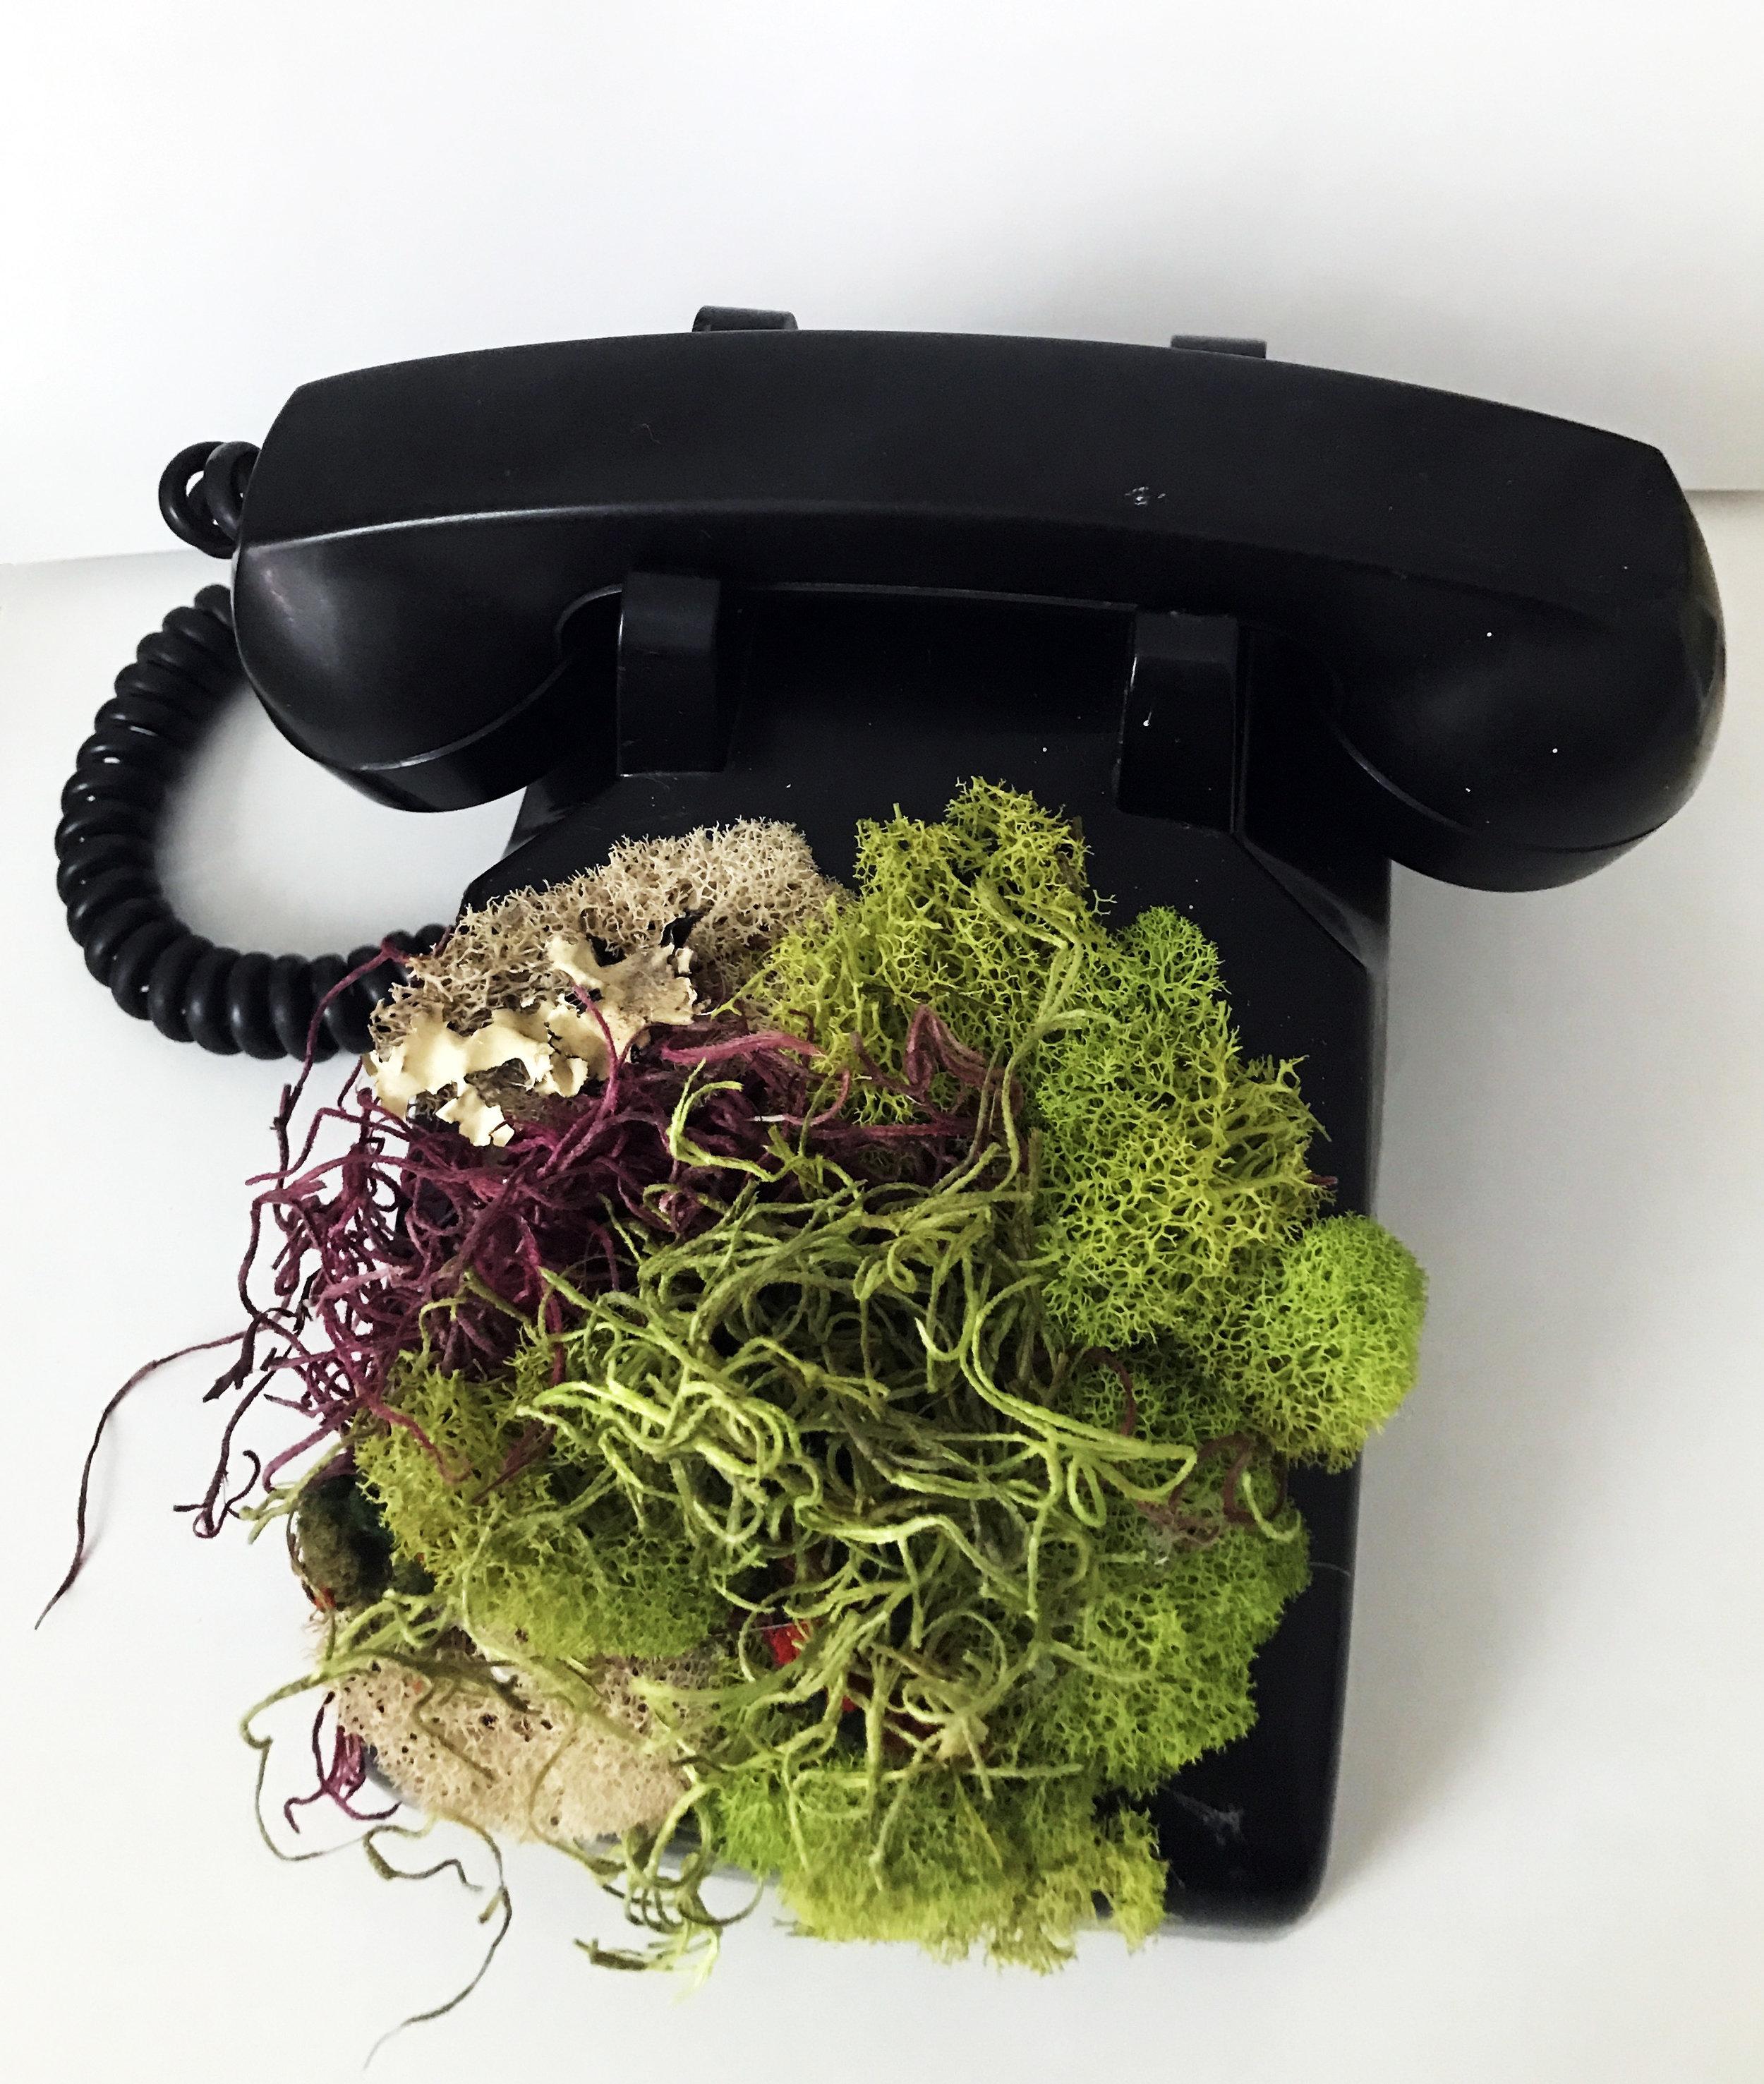 "Noelle King,  Moss Phone , 2016, moss and antique telephone, Gr. Ht. 5"", gr. length 10"", gr. width 10"""